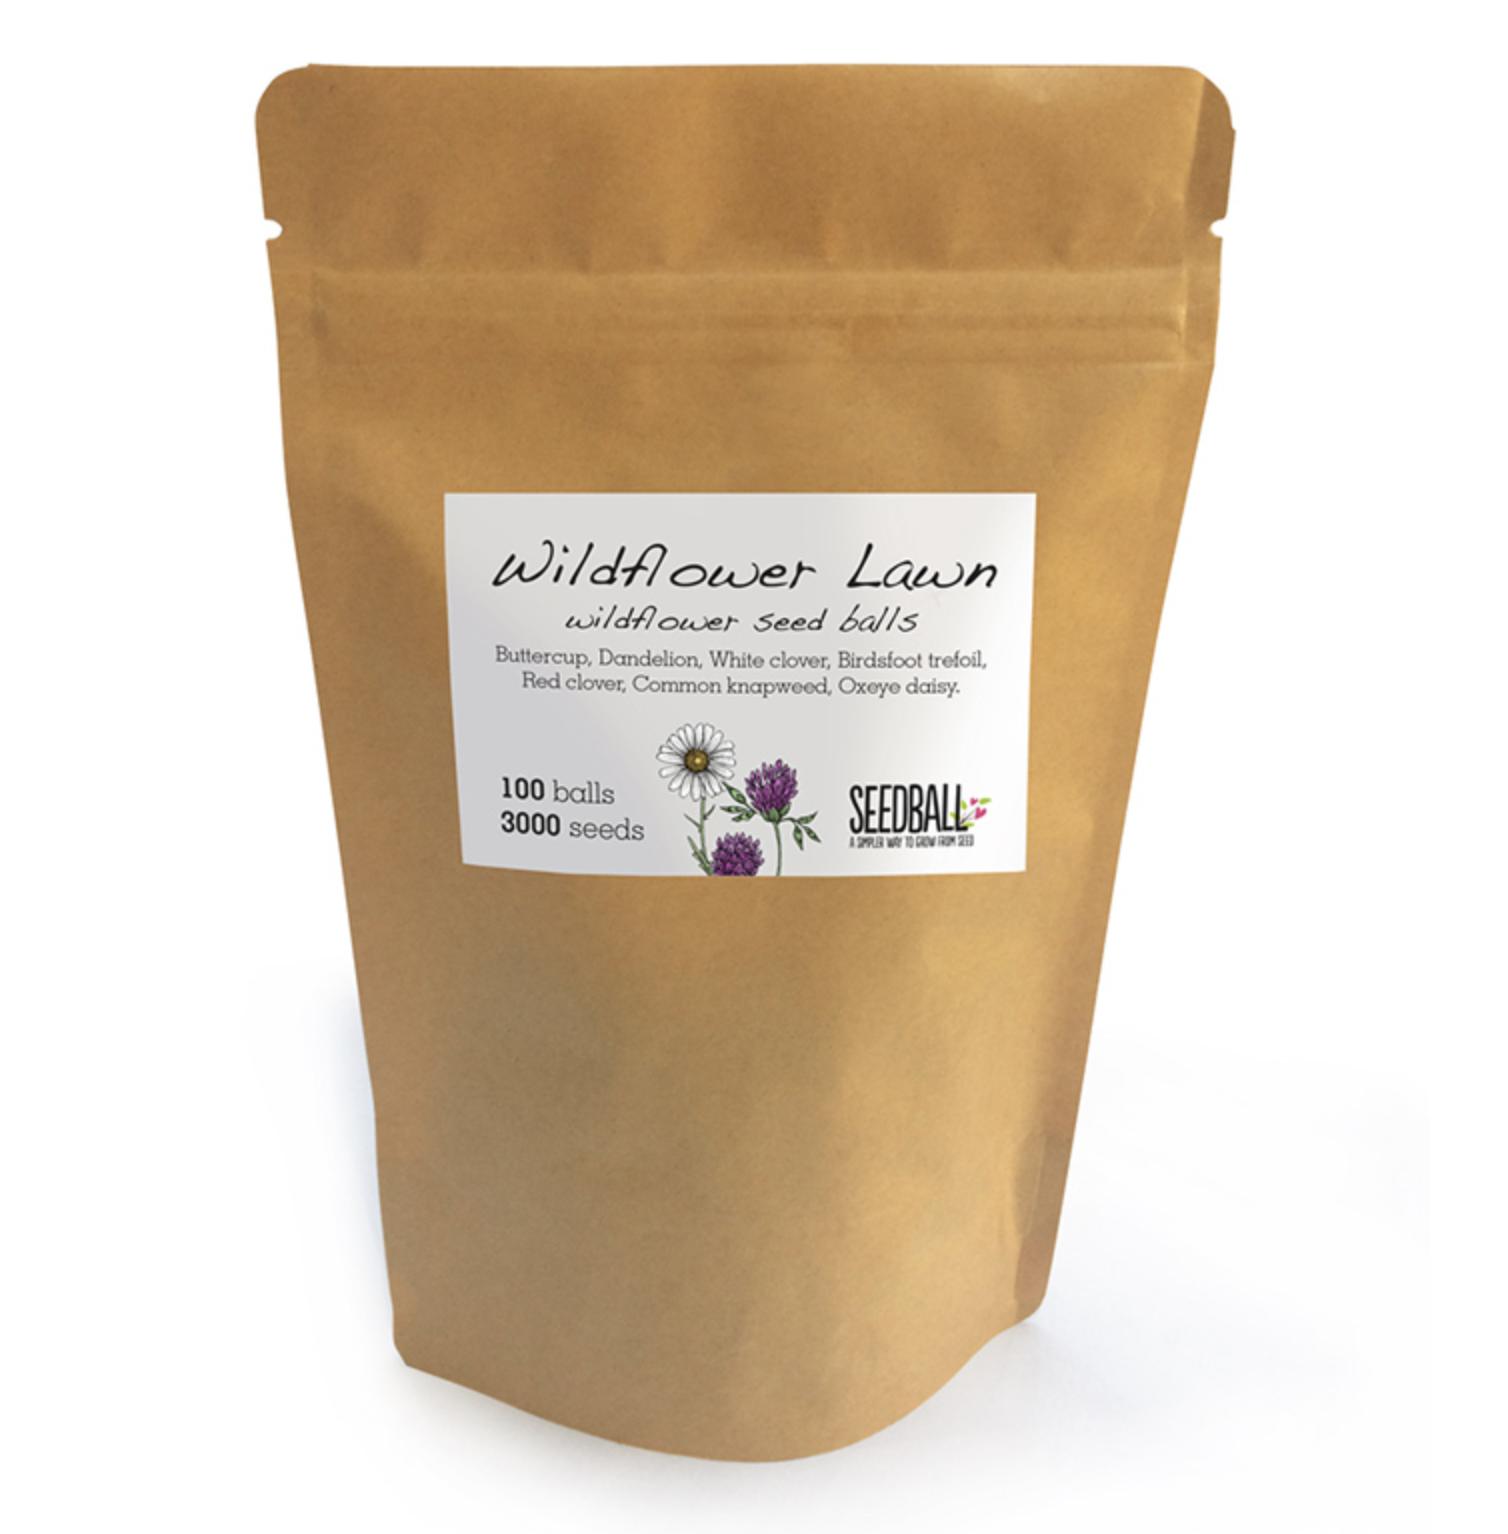 Partner's a keen wild garden fan? Seedball's £12 Wildflower bags will go down well